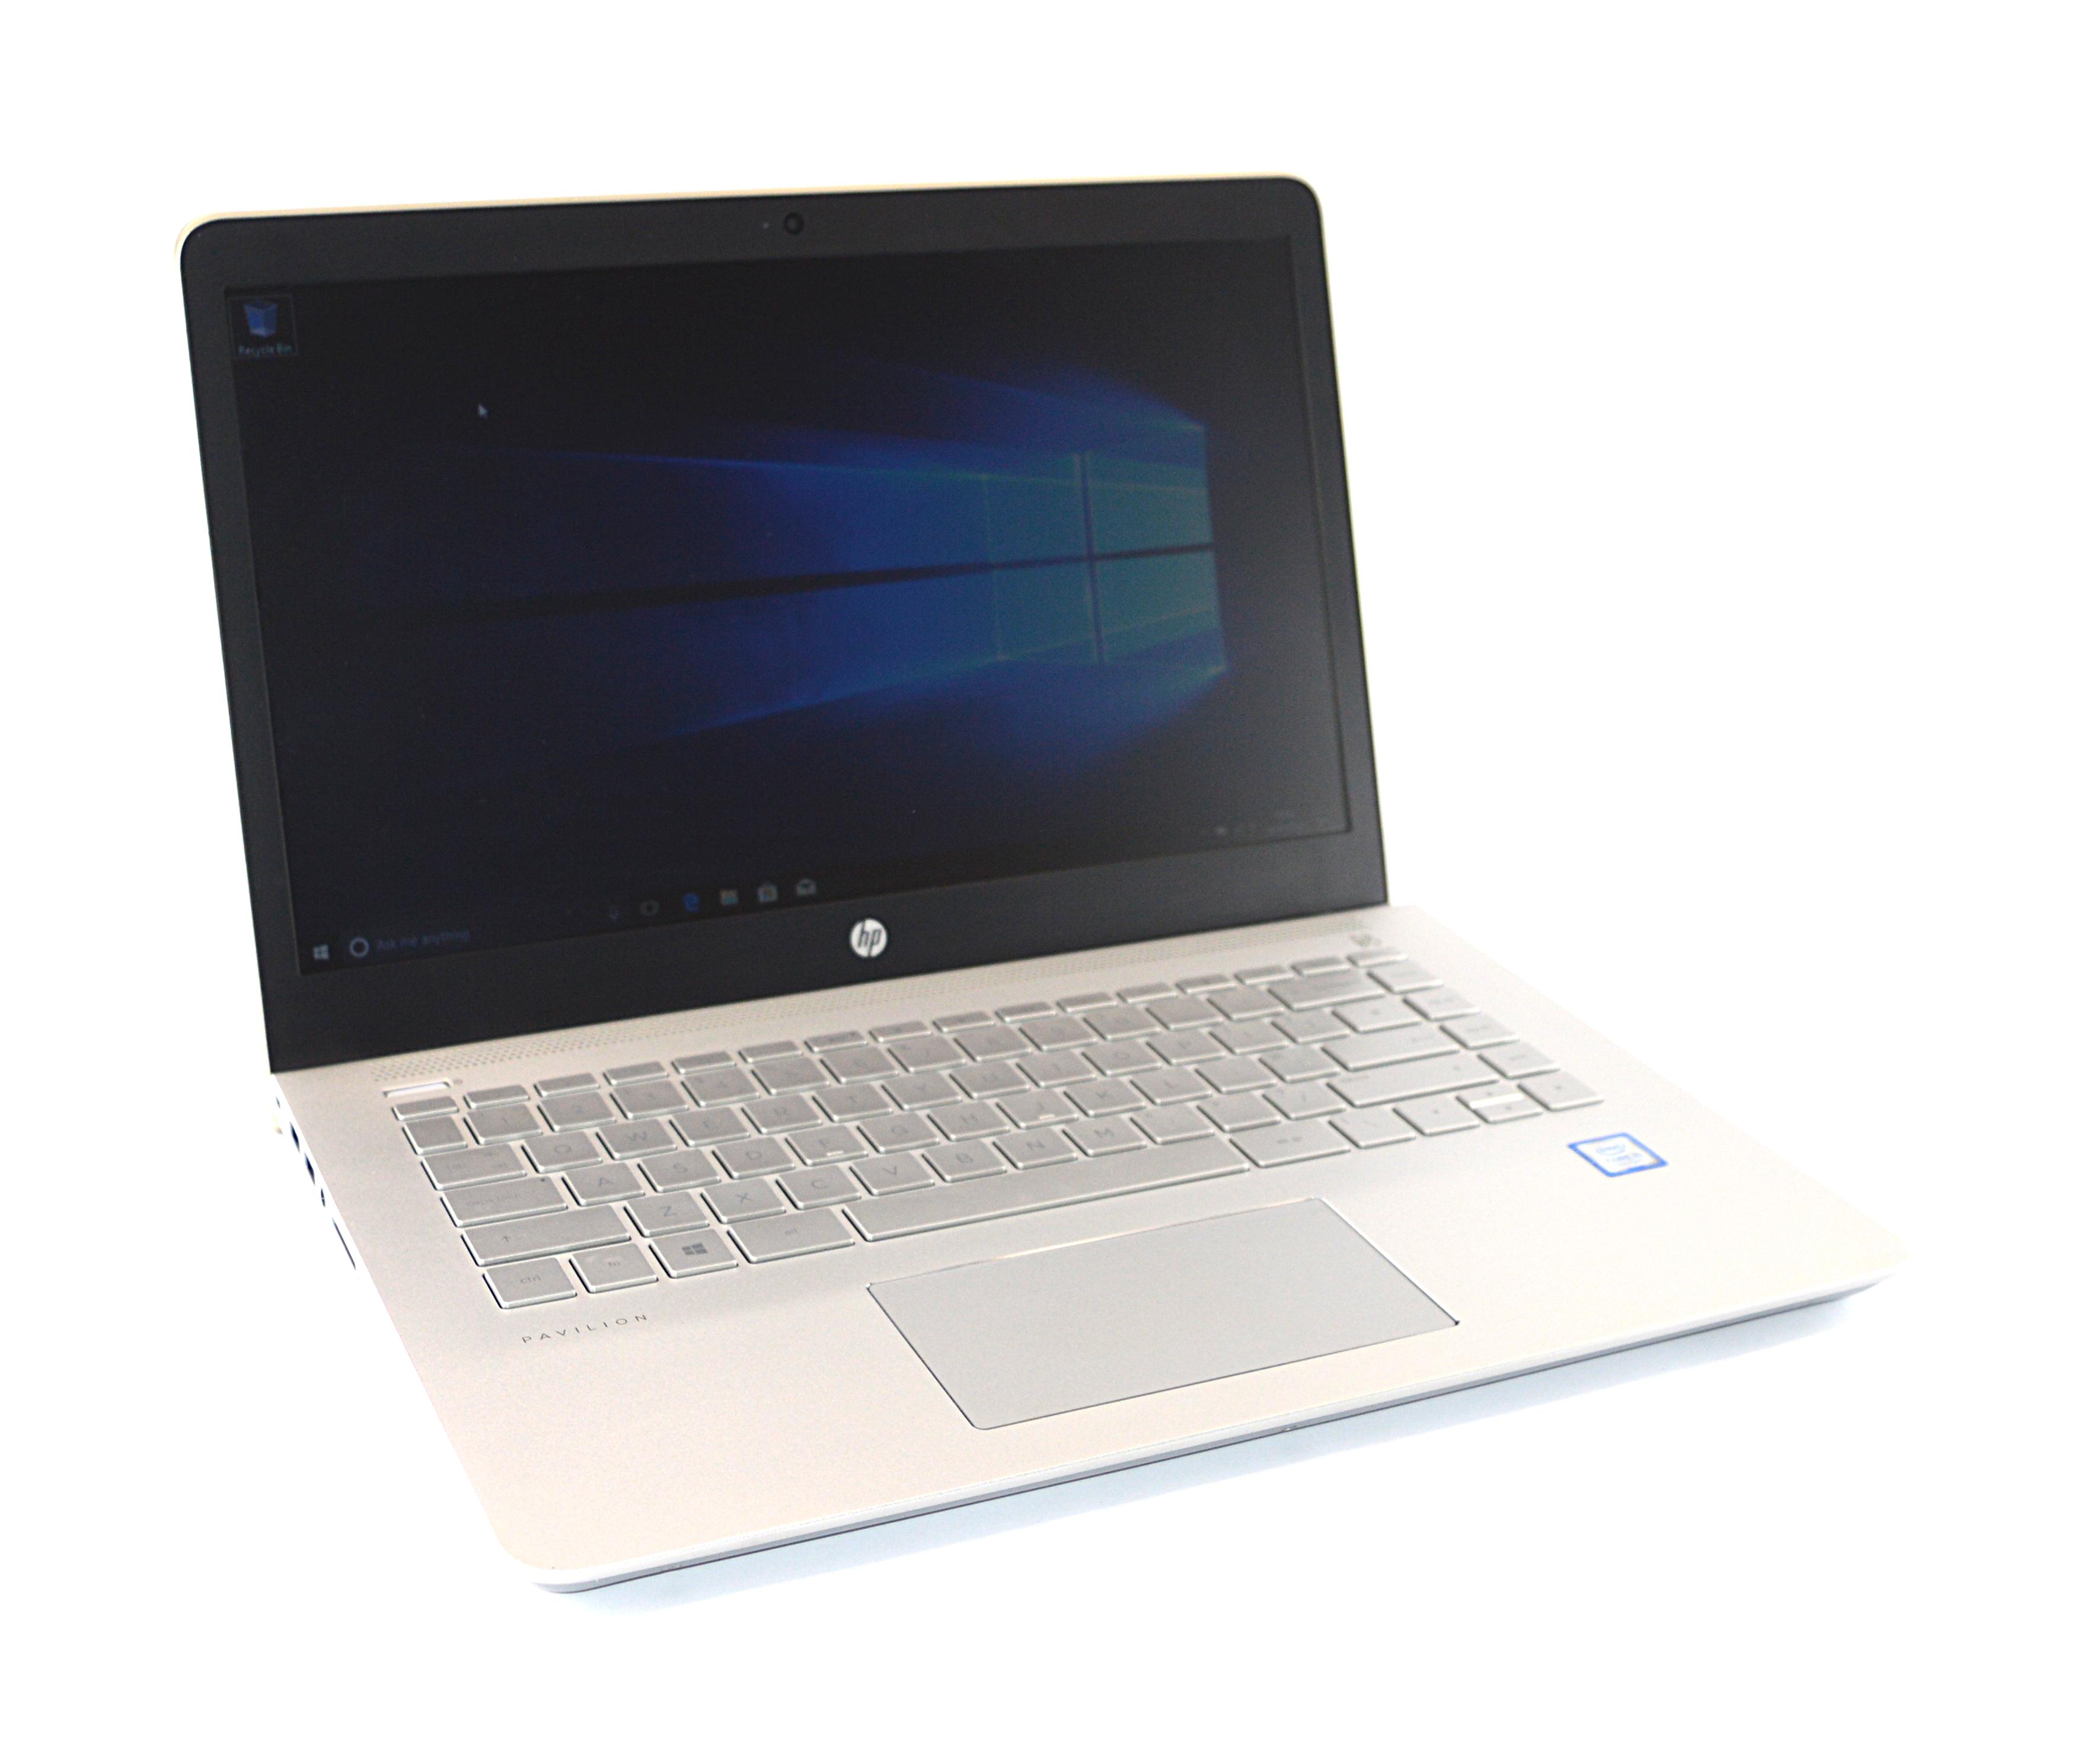 "HP Pavilion 14-BK064SA Laptop Core i5-7200U 8GB RAM 128GB SSD 14"" Windows 10"